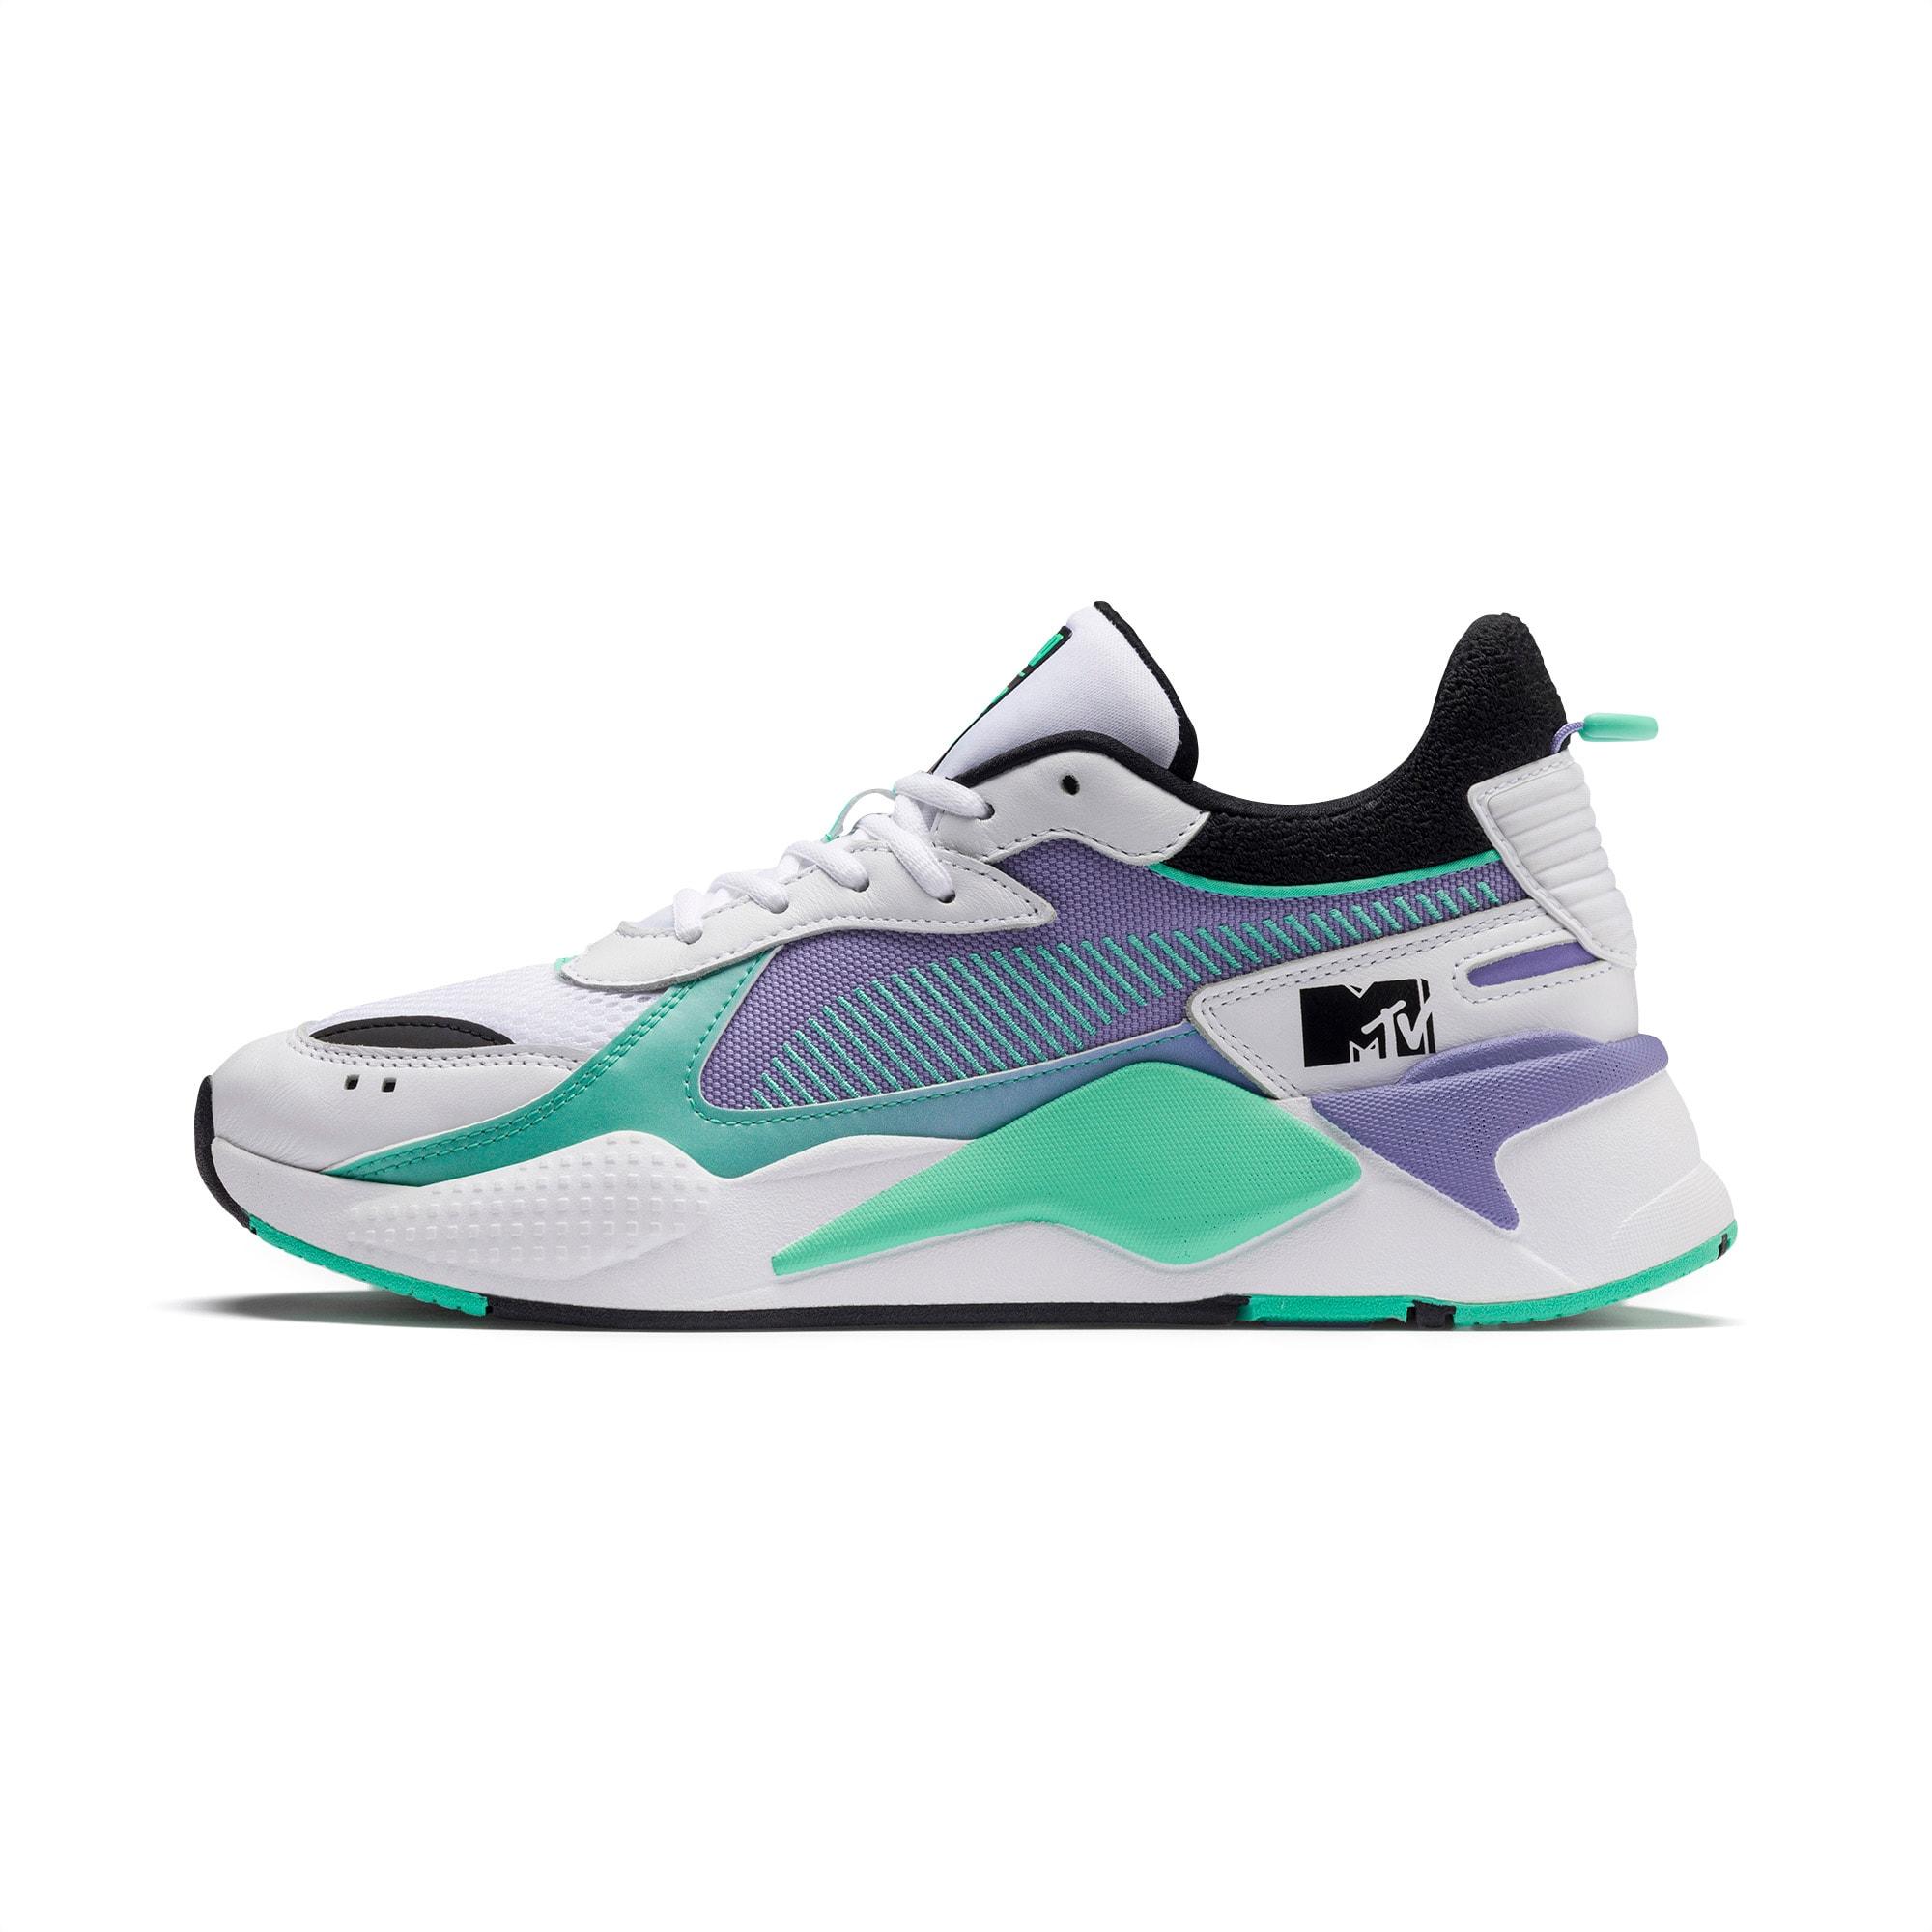 RS-X Tracks MTV Gradient Blaze Sneakers